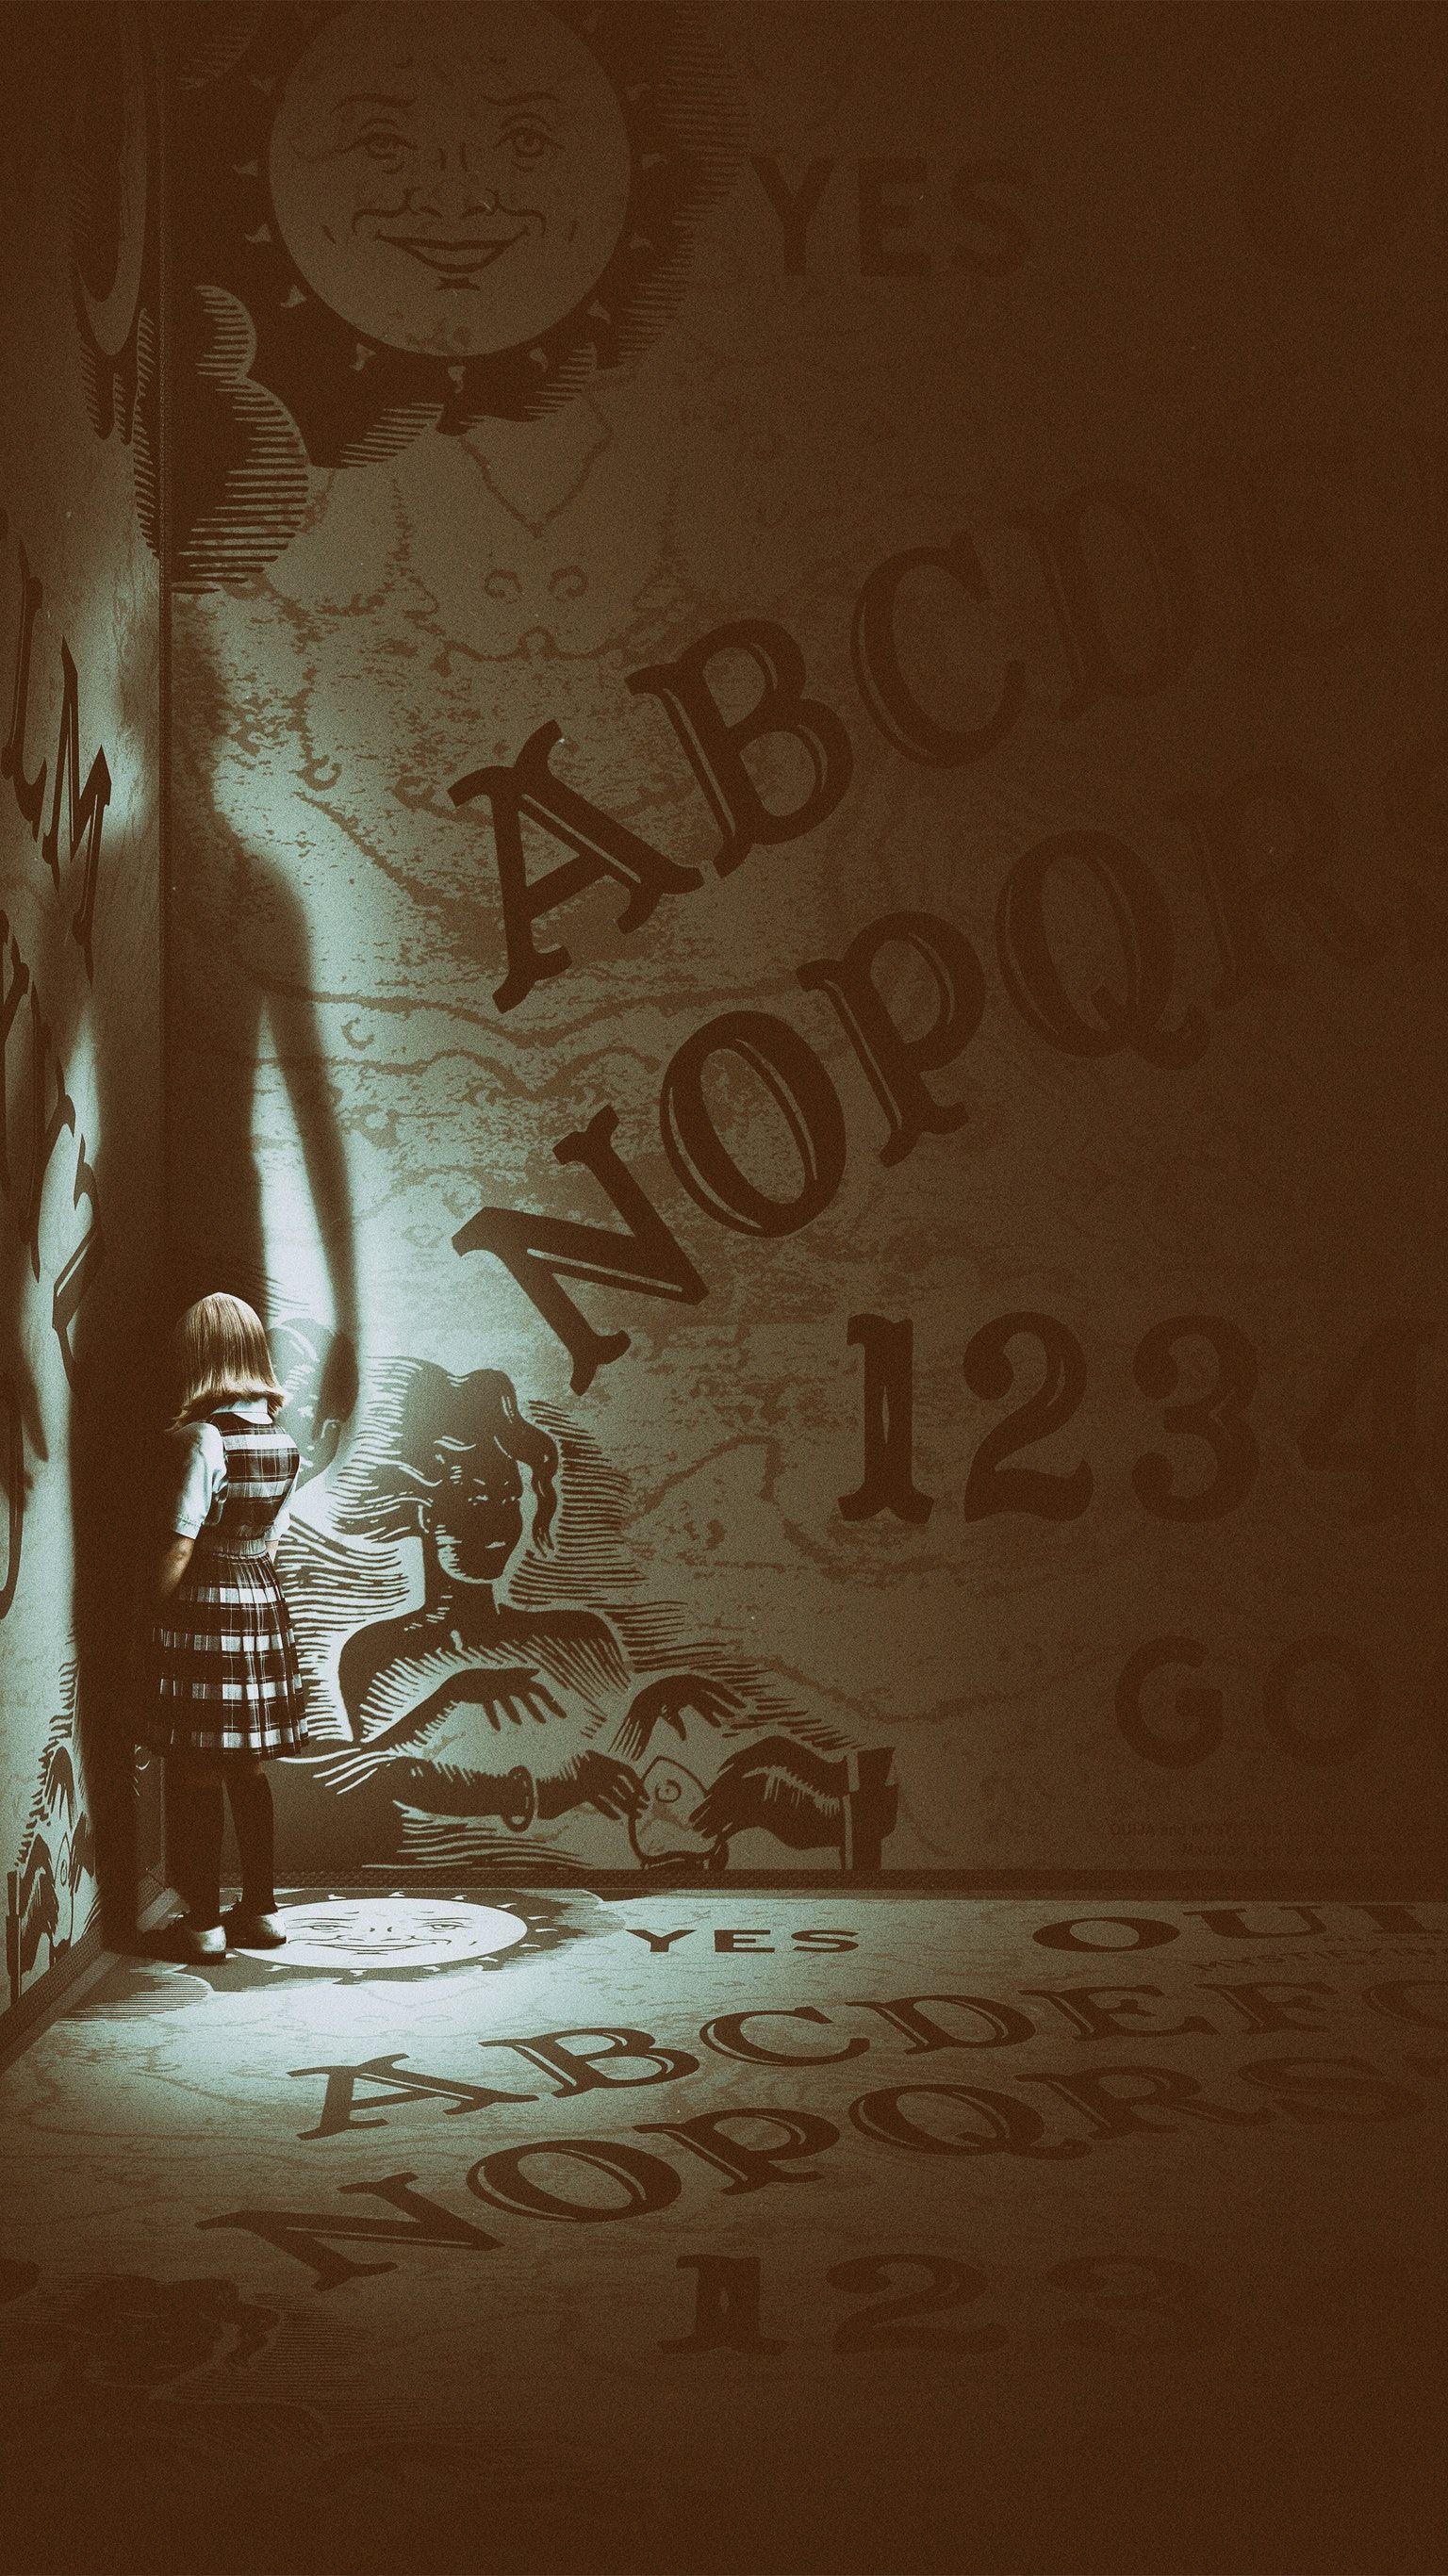 Ouija Origin Of Evil   1536x2733 Wallpaper   teahubio 1536x2733